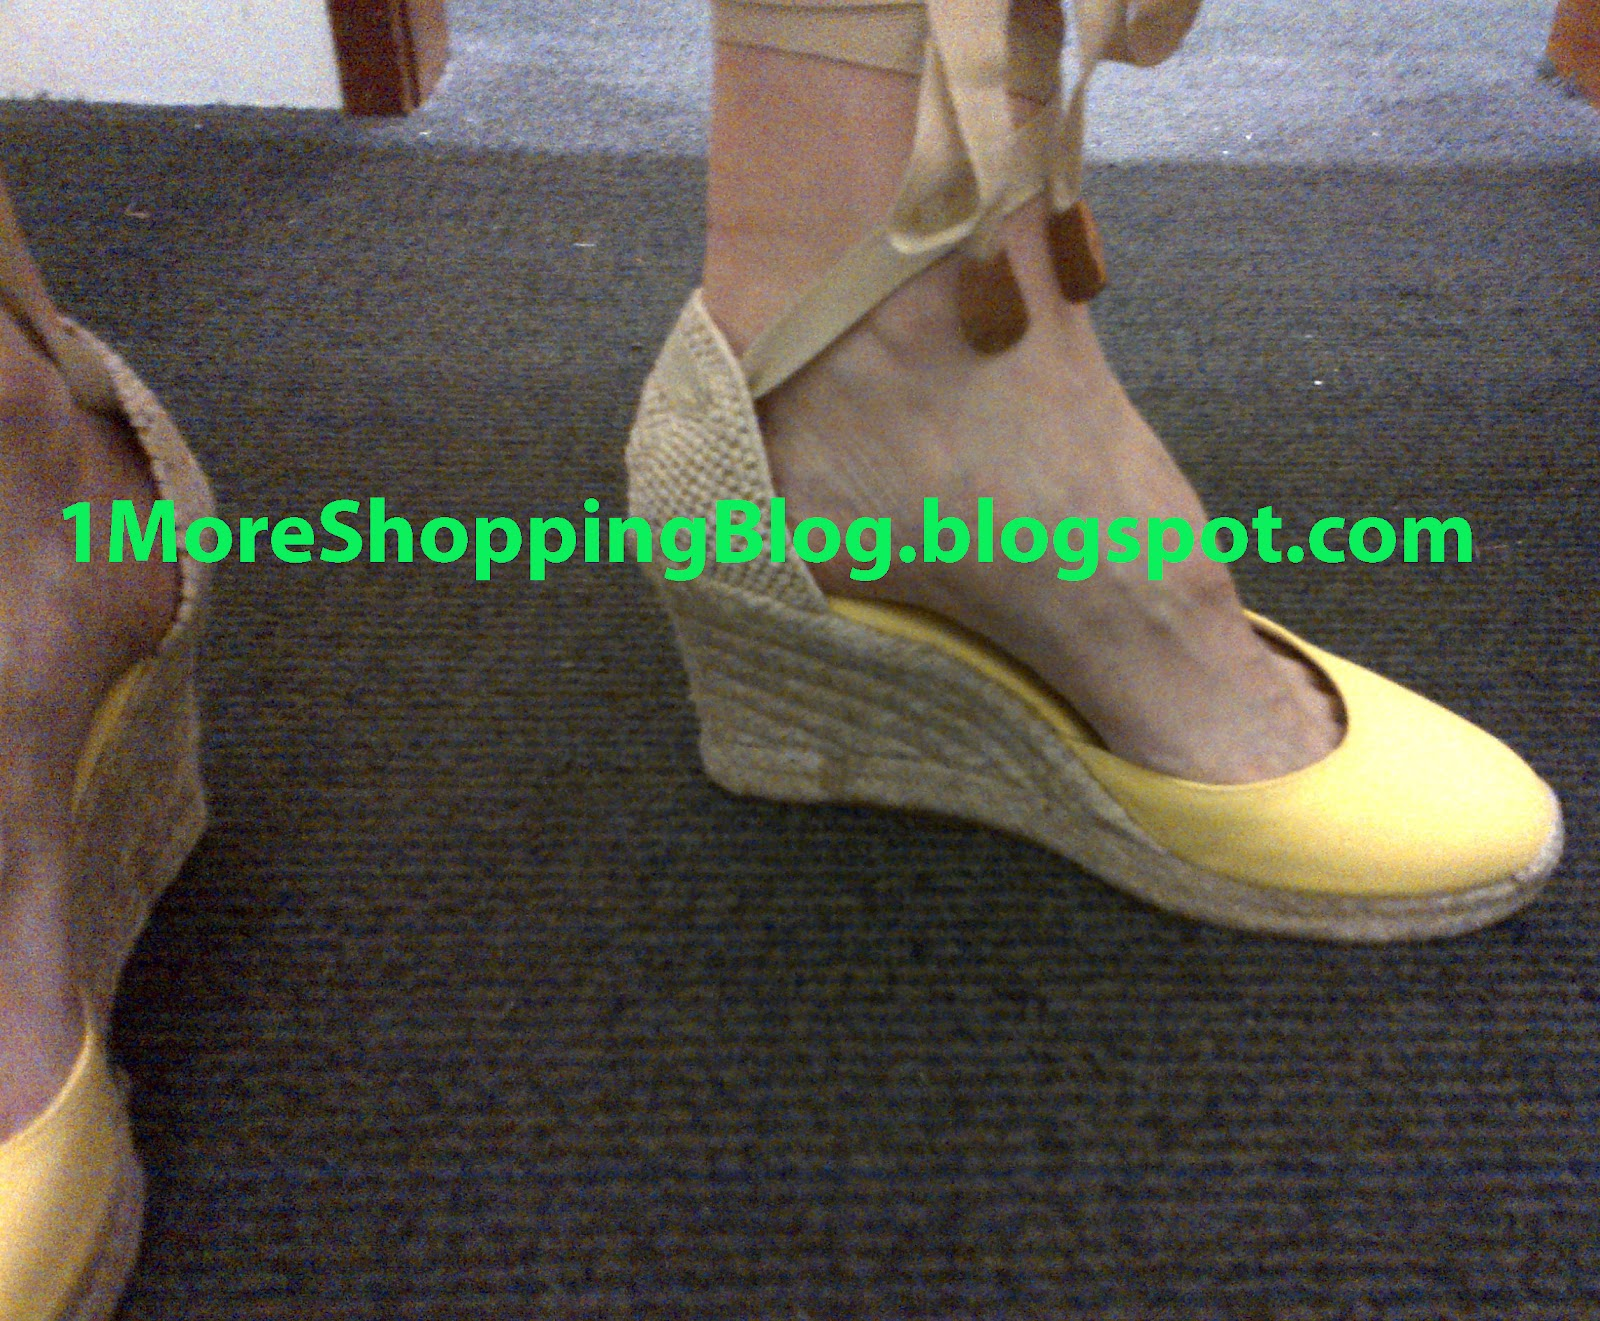 ac1ededaff6 1 More Shopping Blog: J. Crew - May (II)